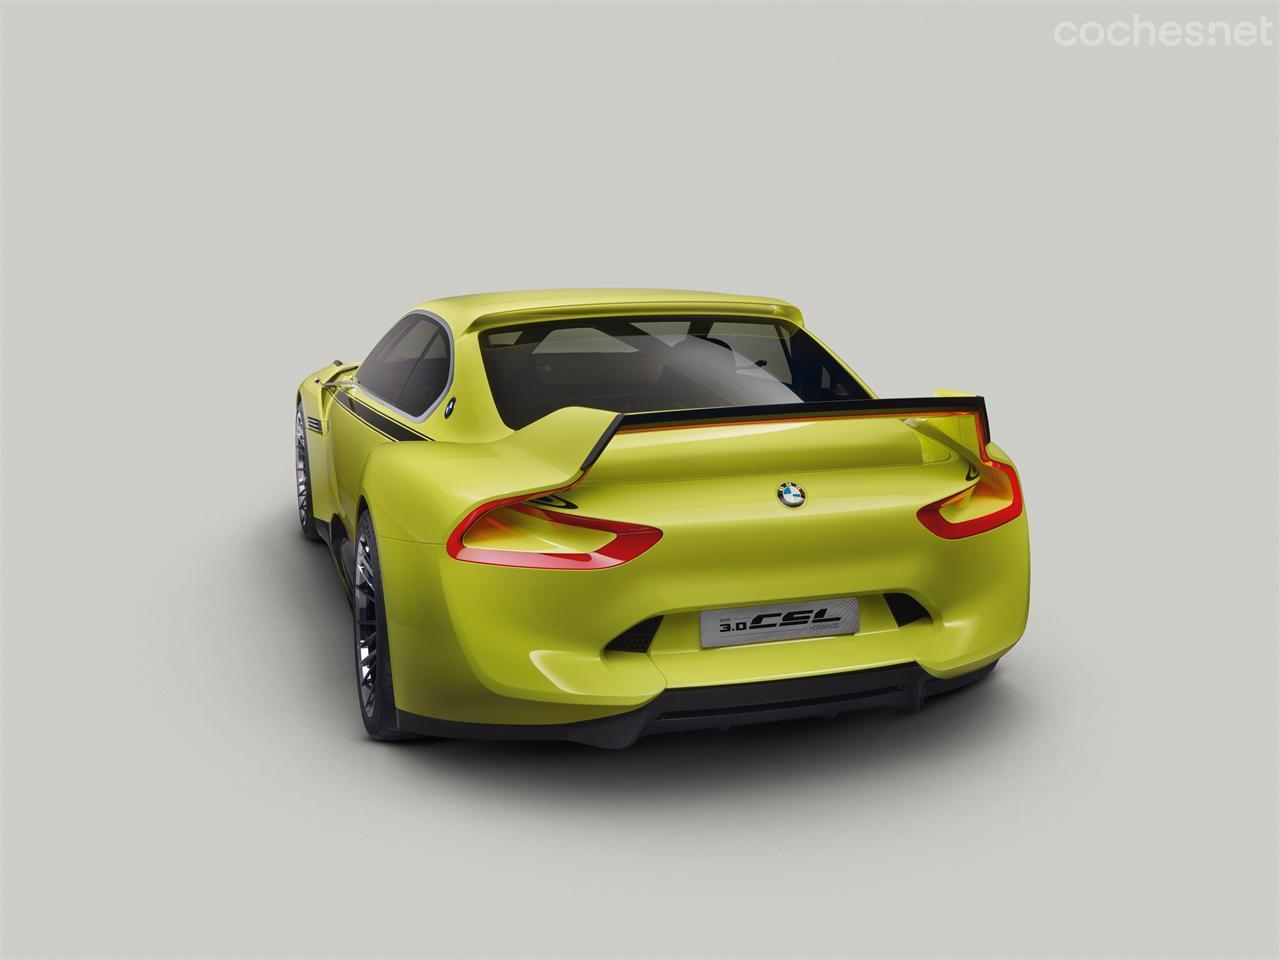 BMW 3.0 CSL Hommage Concept - foto 7